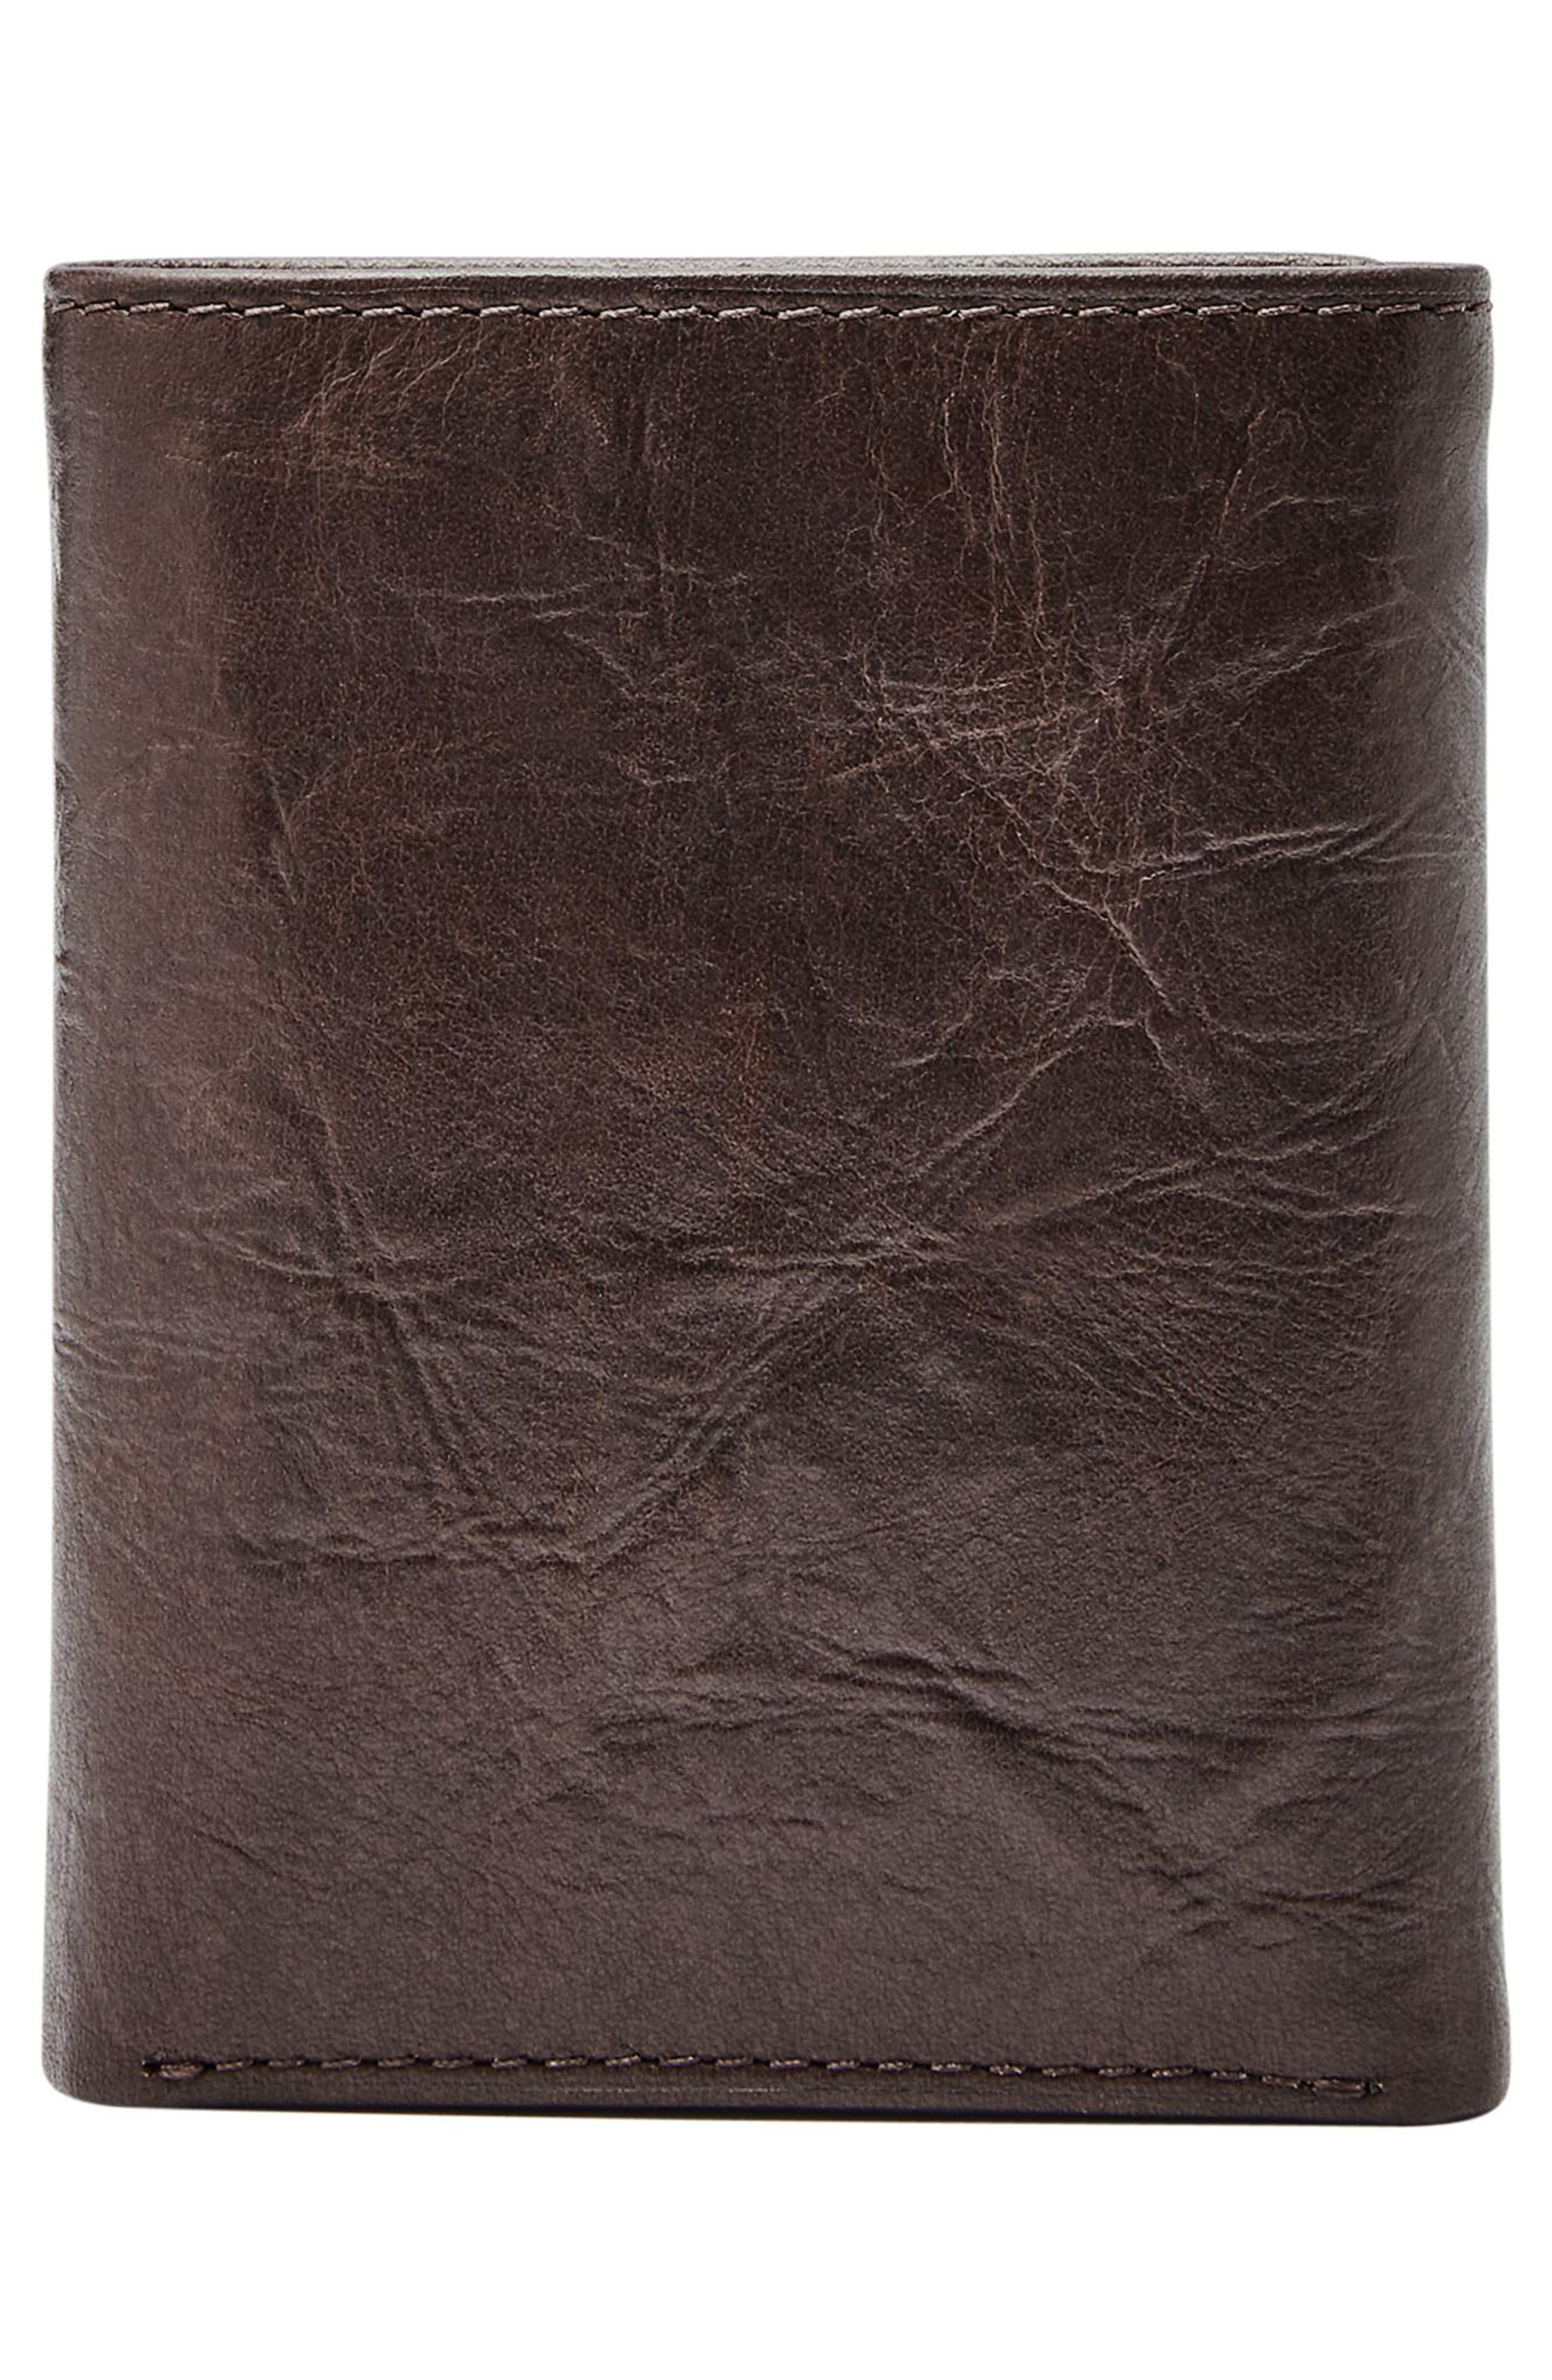 Alternate Image 3  - Fossil Neel Leather Wallet